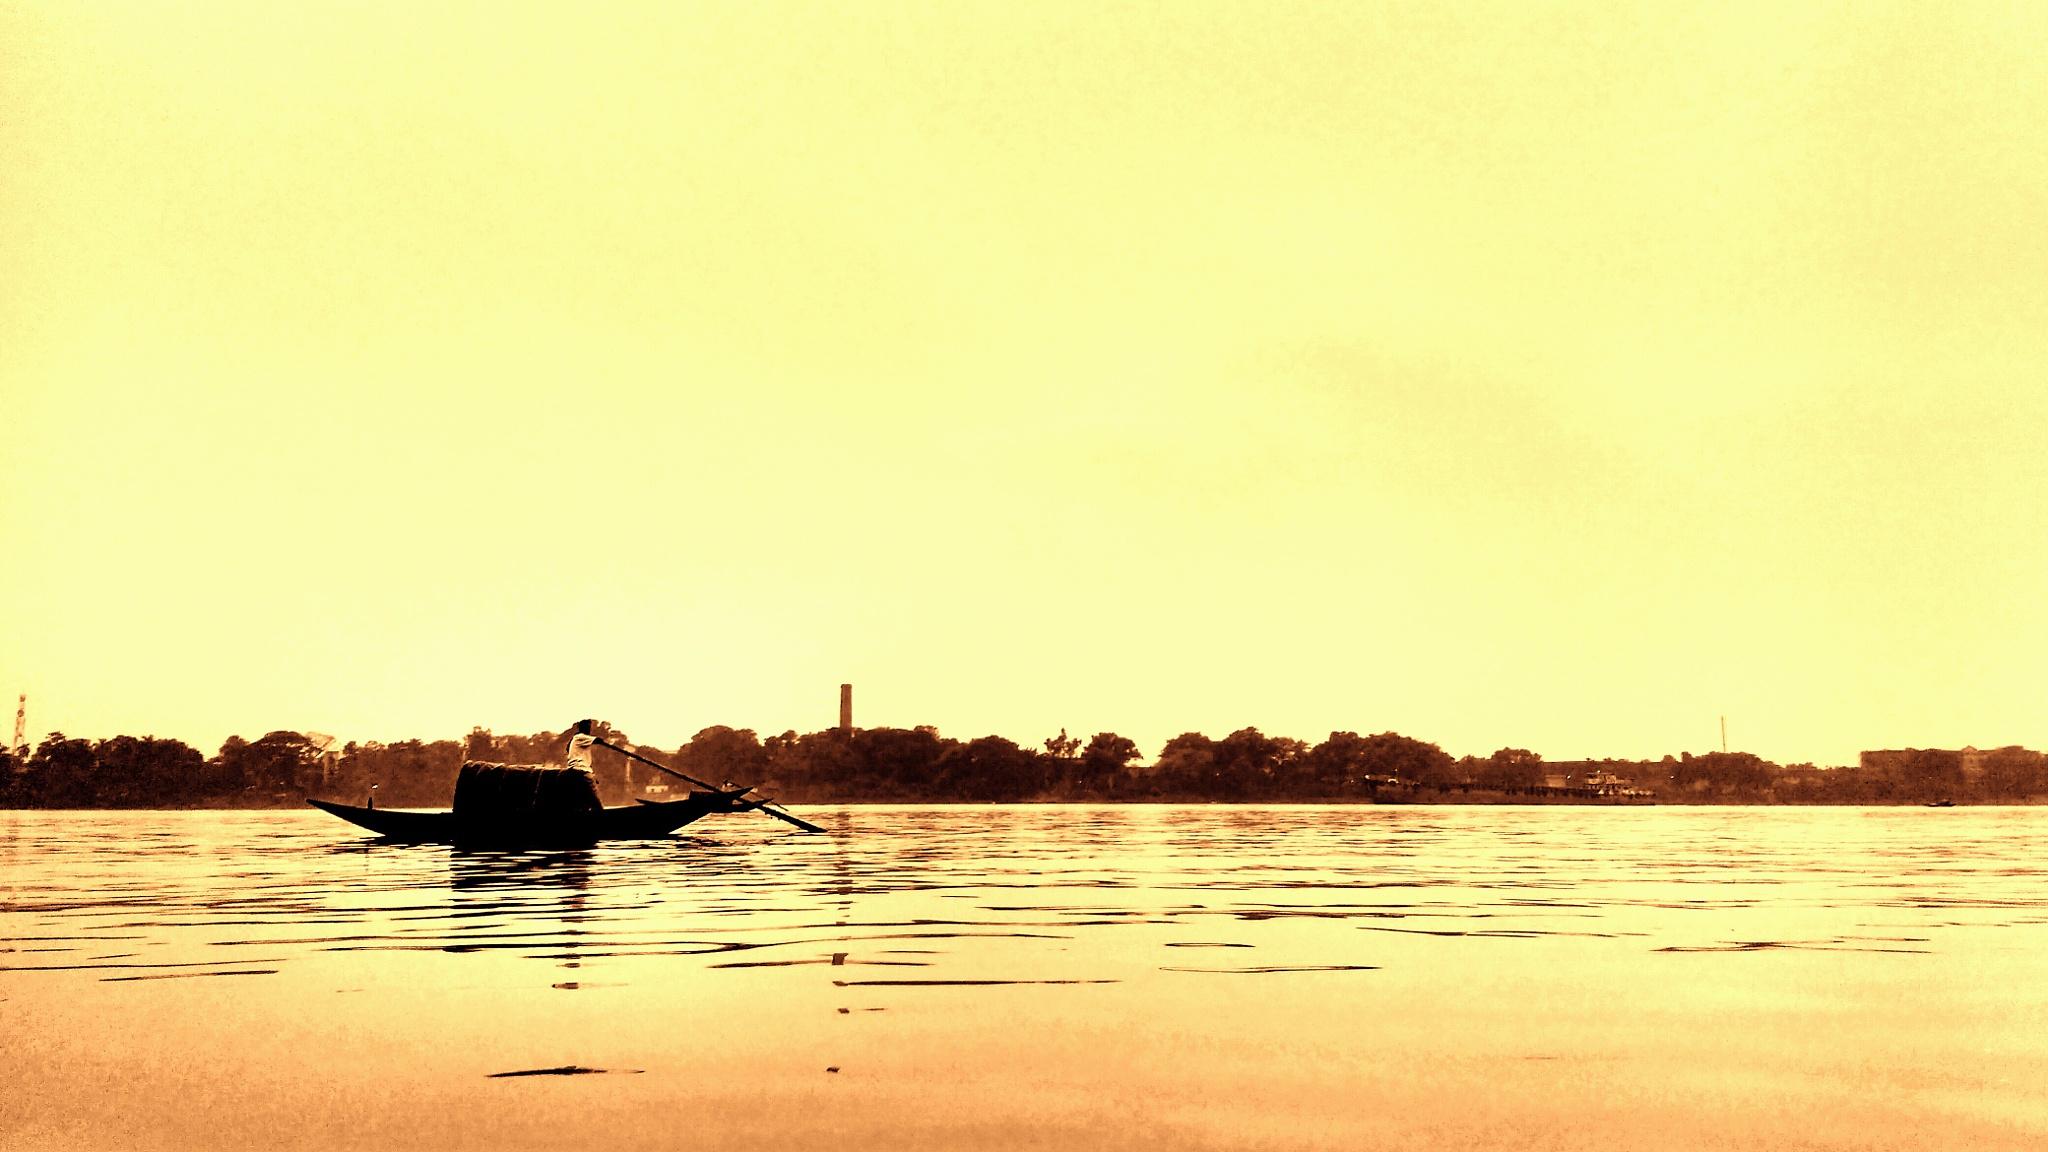 rowing the way. by SabujGhosh